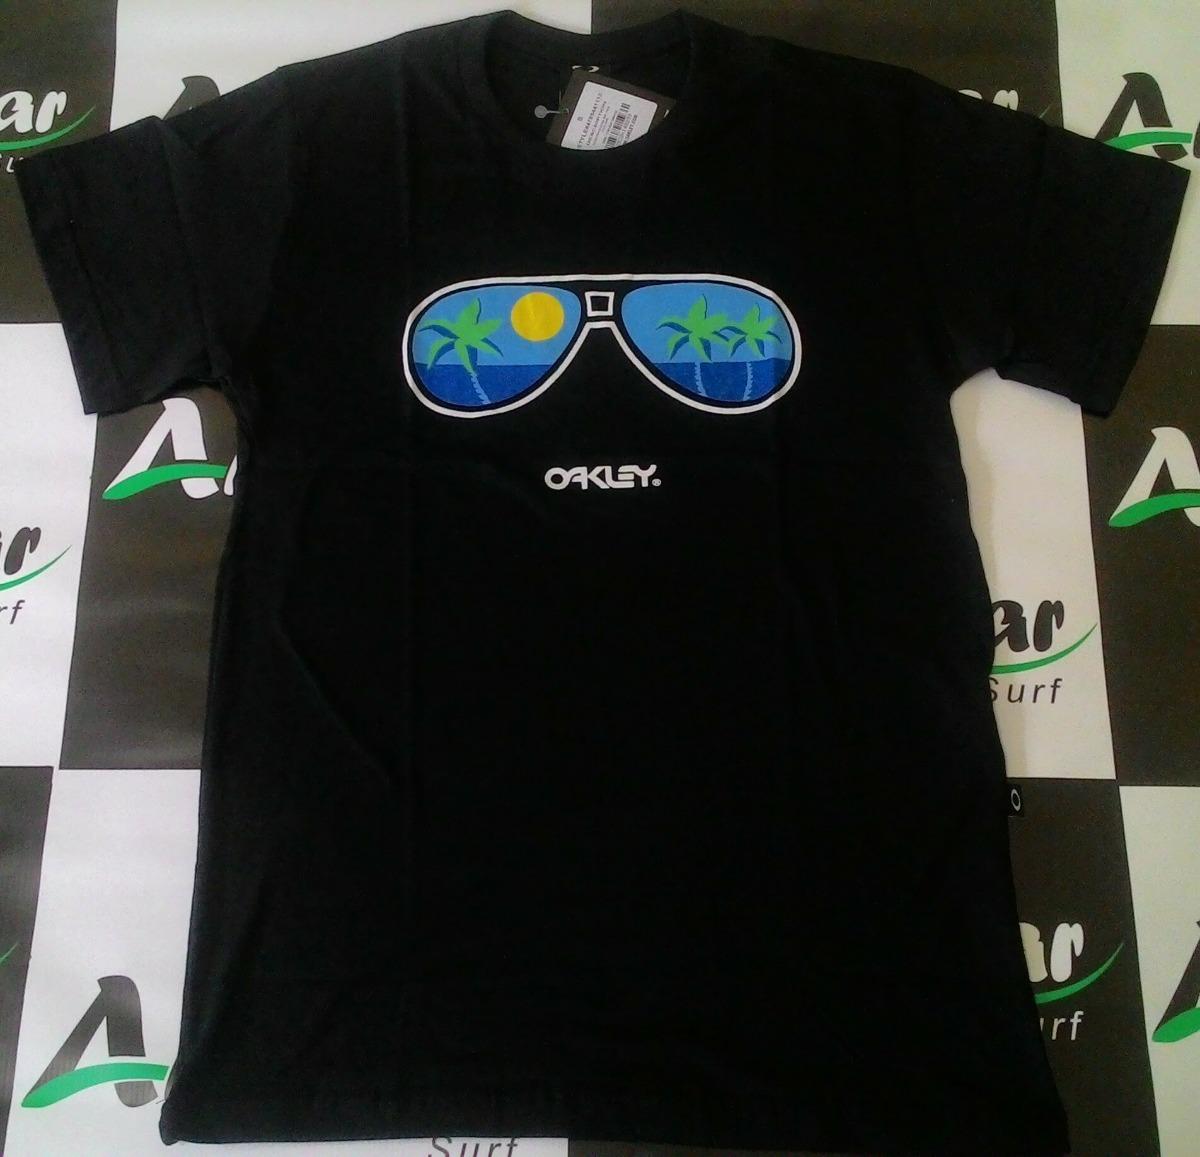 f793d9a16f0eb camiseta oakley original preta blusa camisa - andimar surf. Carregando zoom.